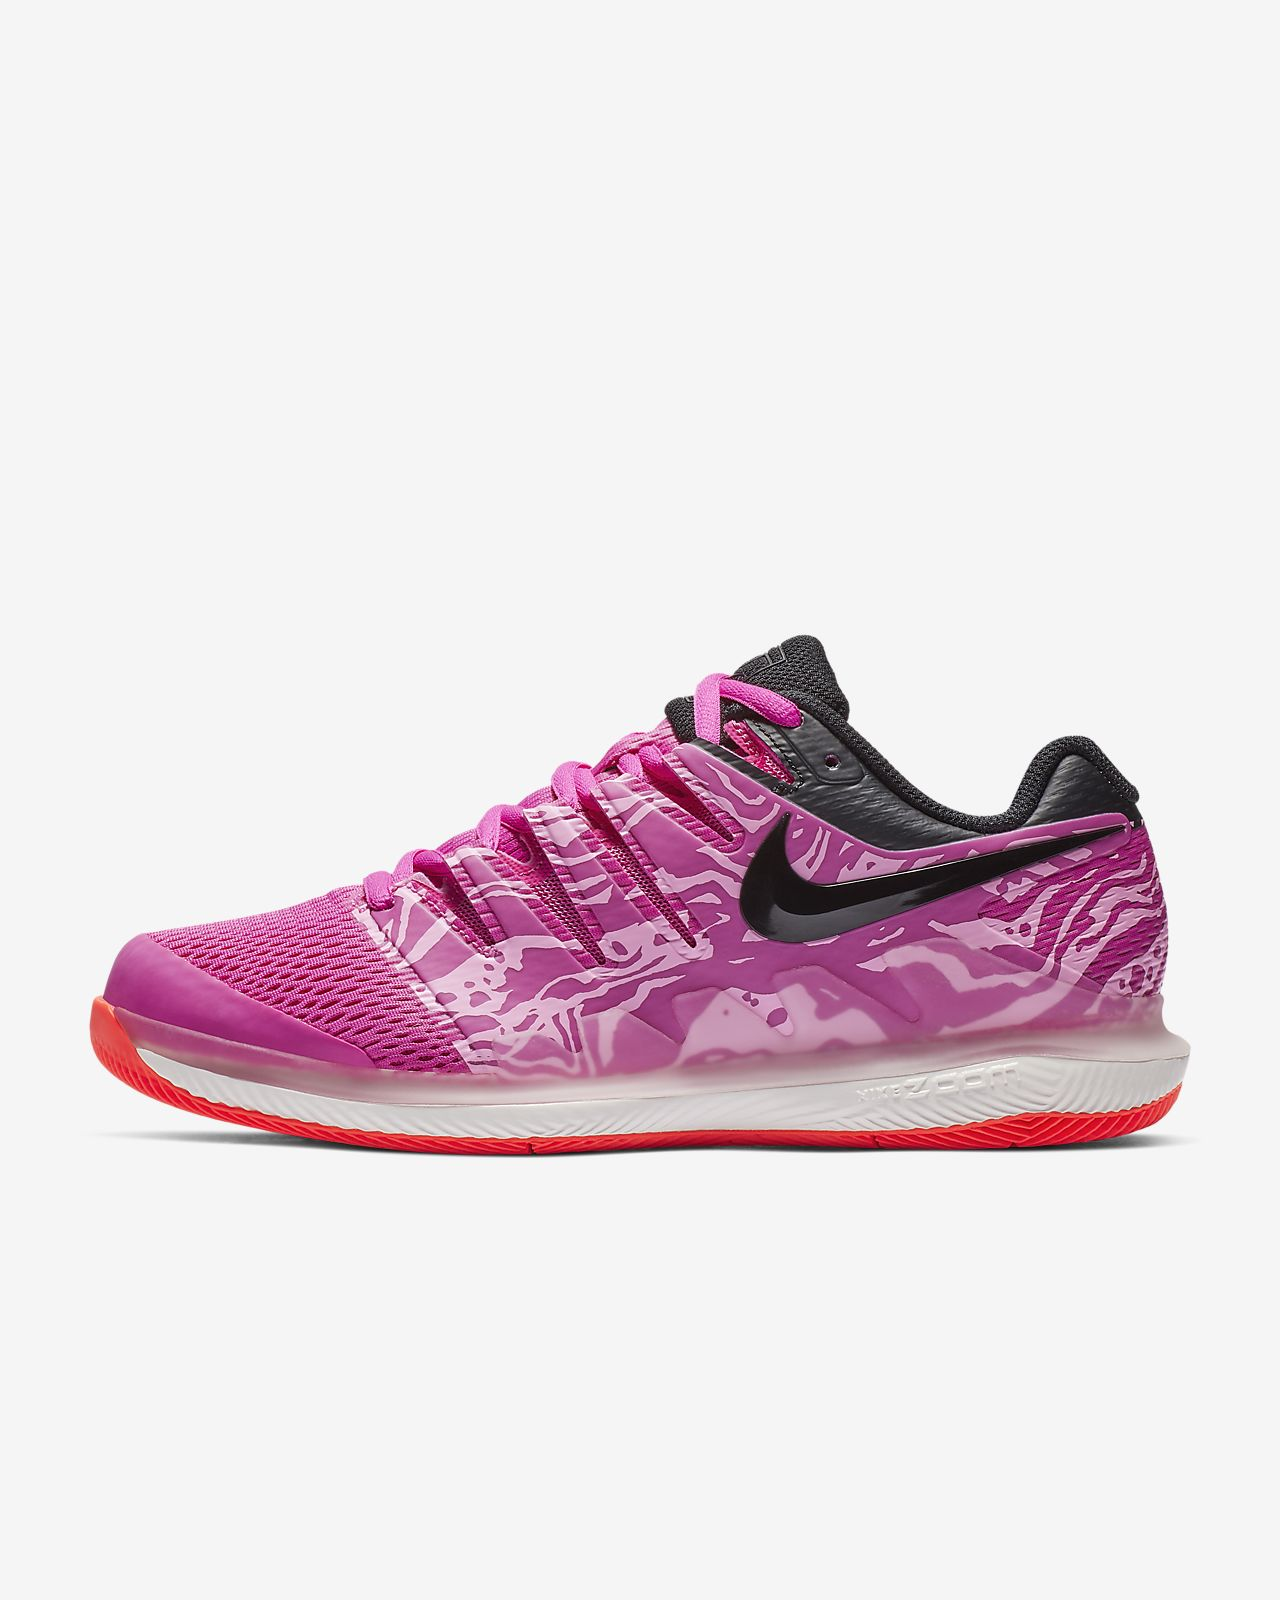 NikeCourt Air Zoom Vapor X-hardcourt-tennissko til kvinder. Nike.com DK 6445d910b